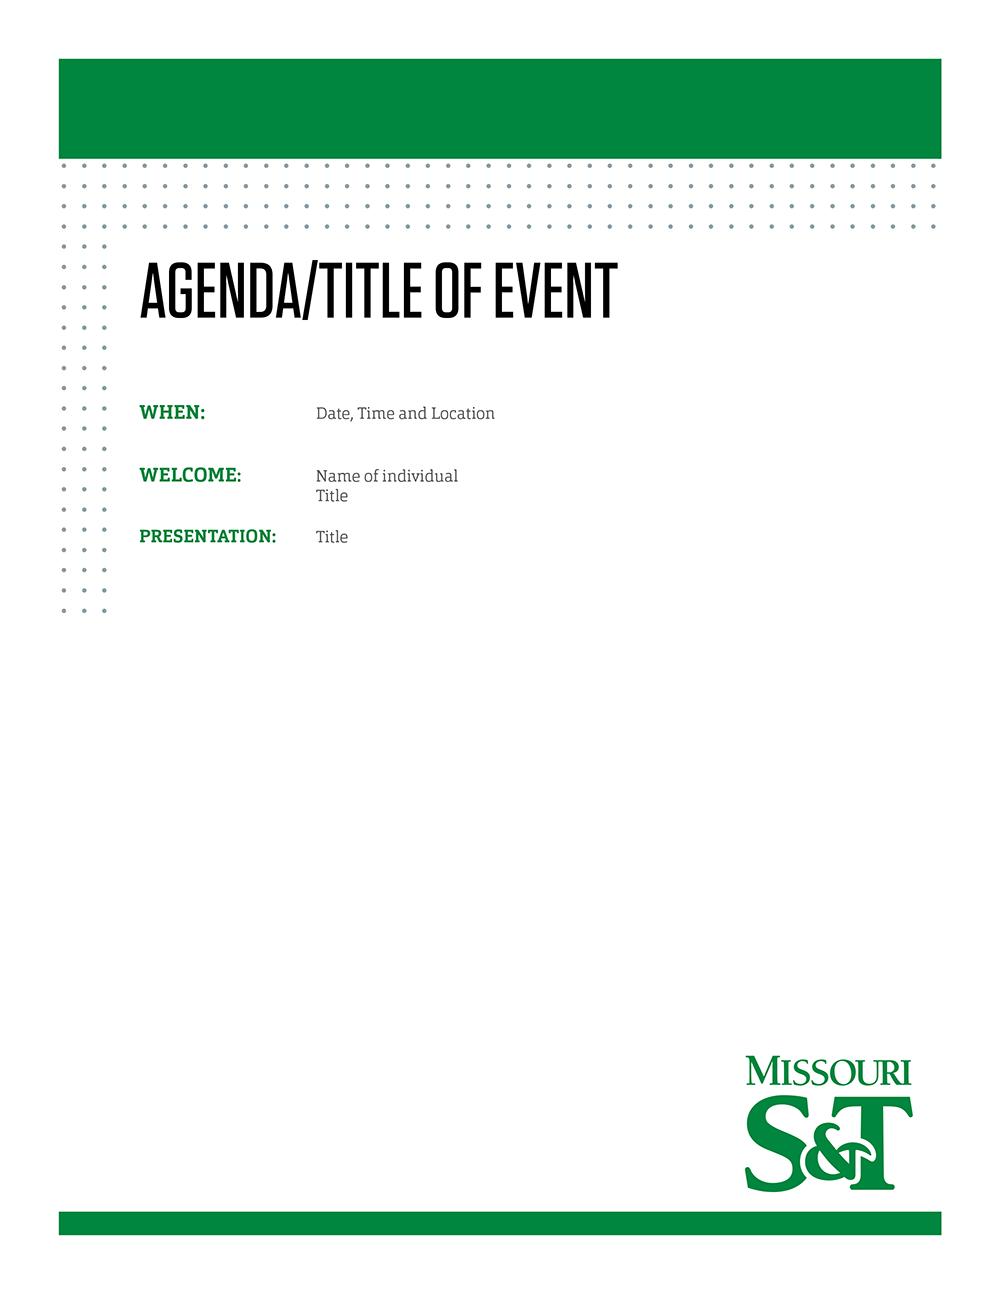 Agenda Design Templates 8 Calendar Agenda Templates Free – Agenda Design Templates